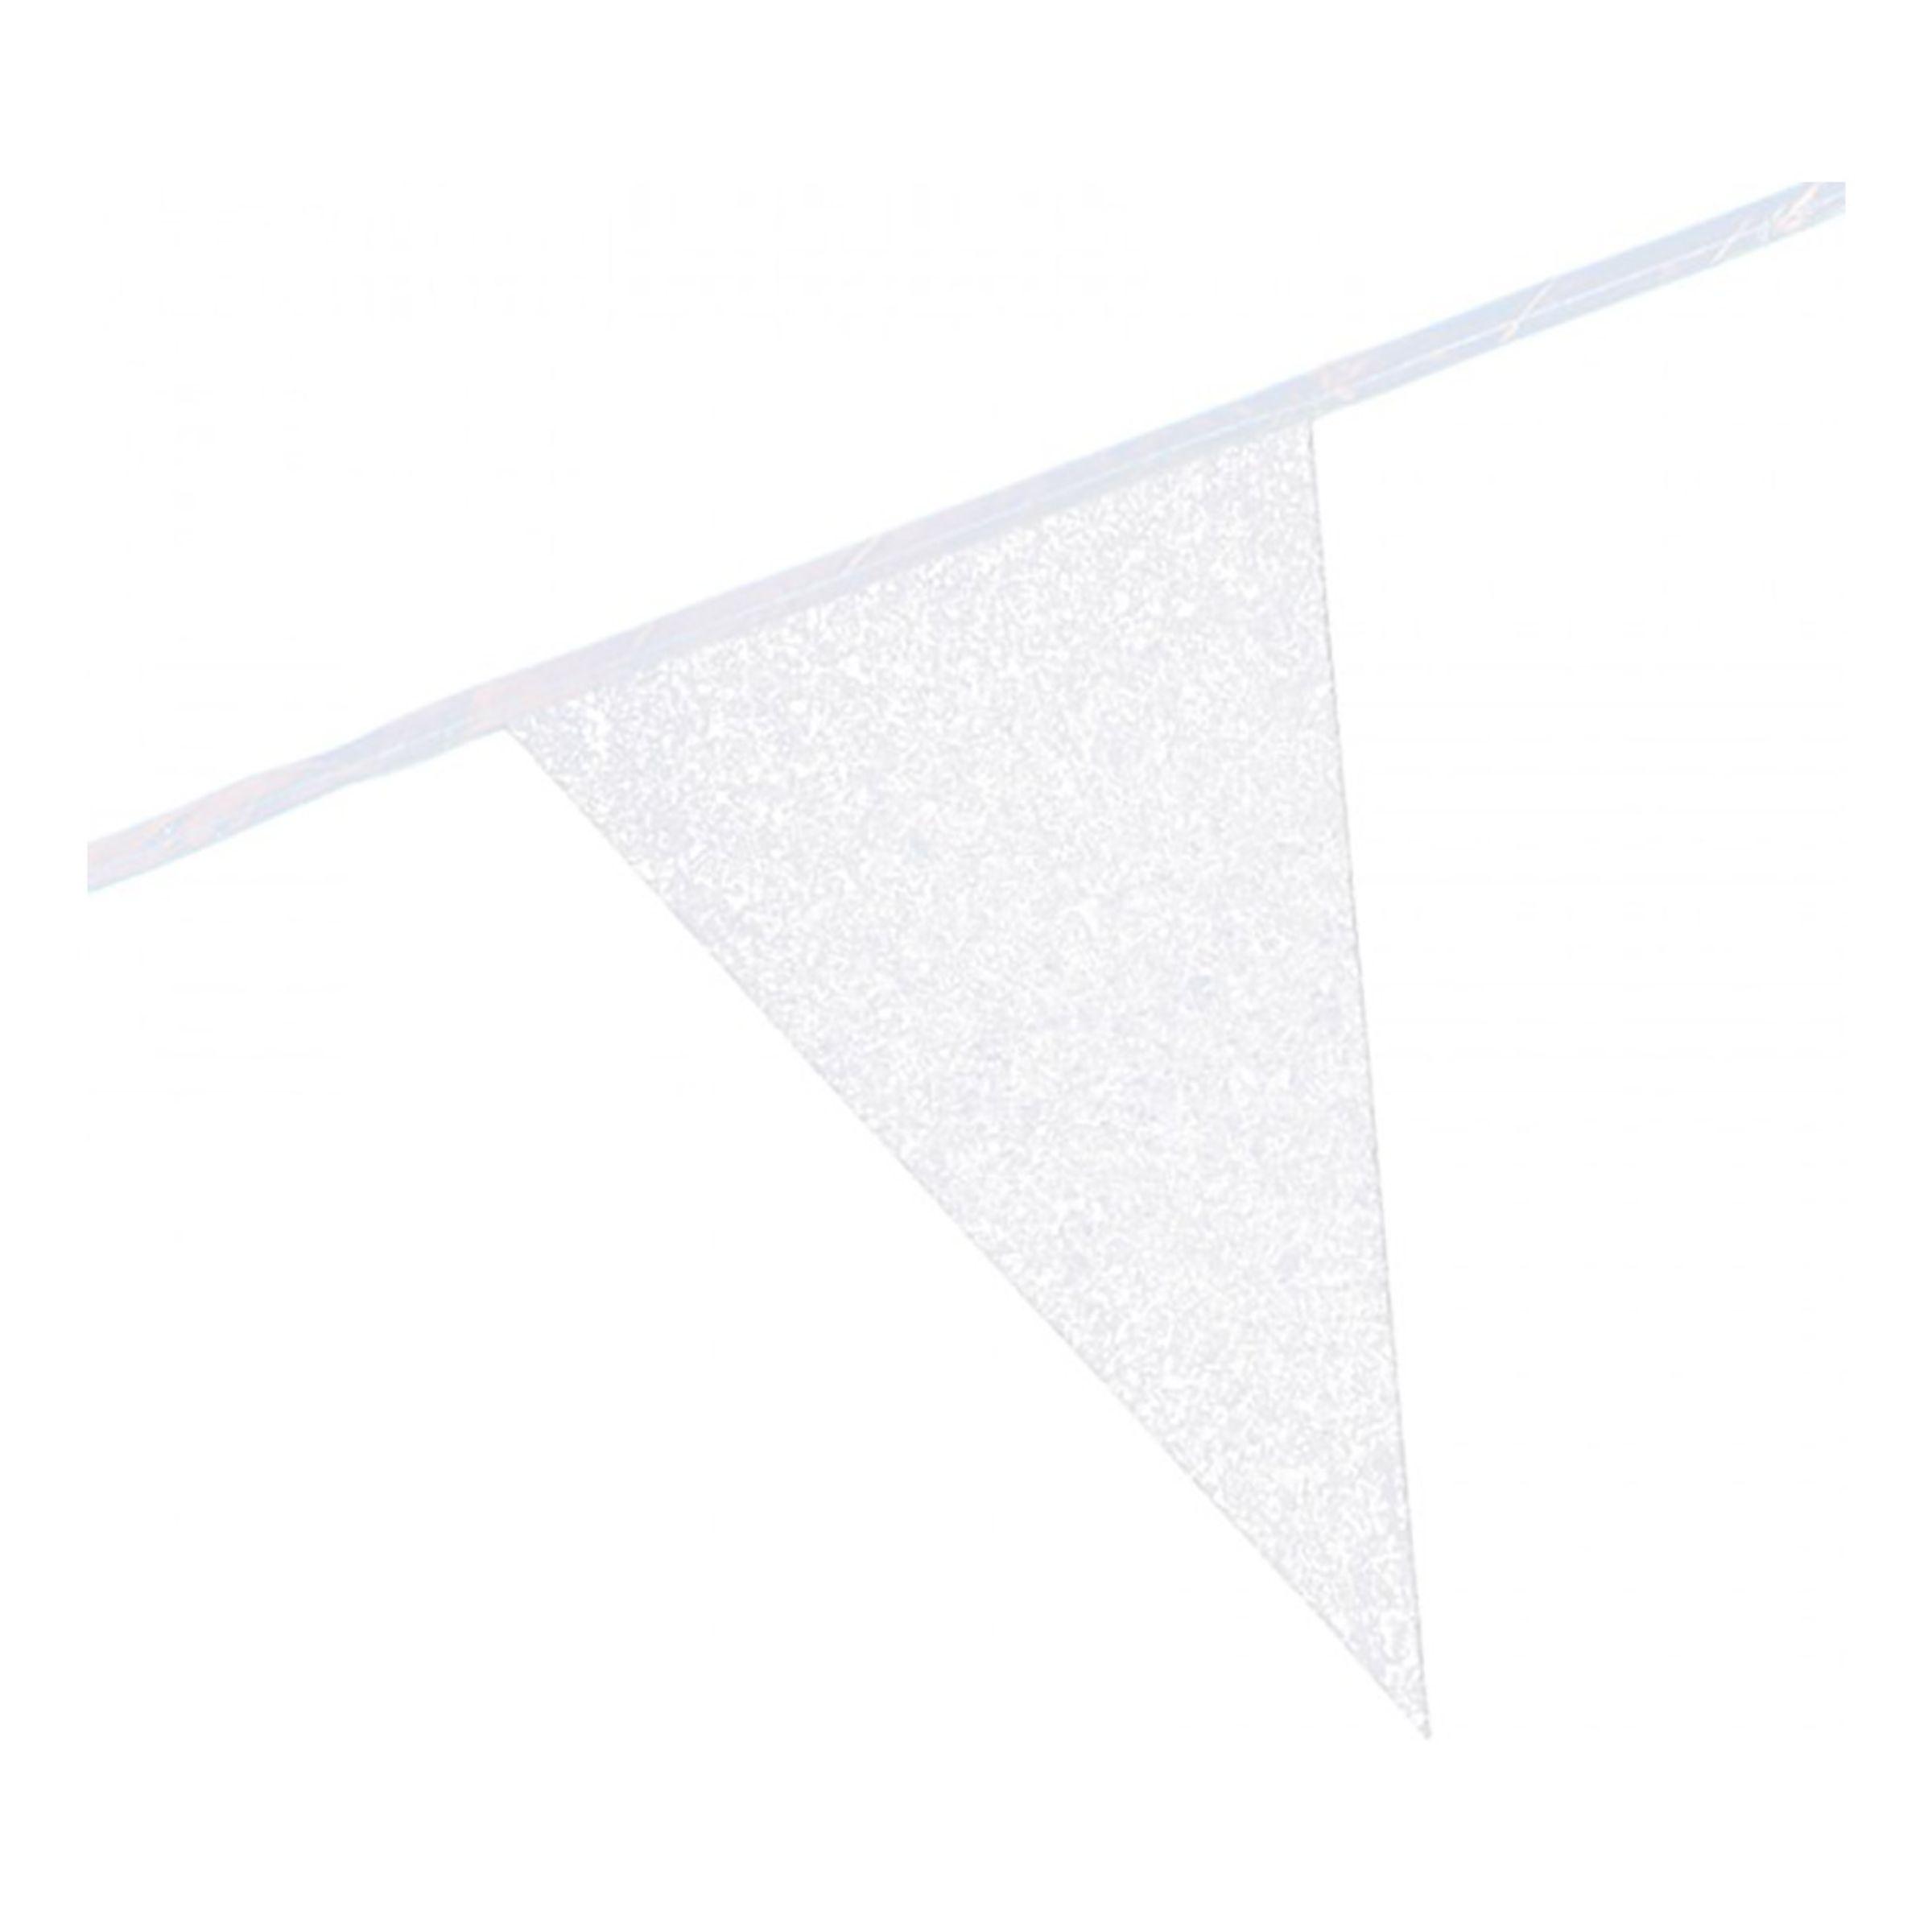 Flaggirlang Glittervit - 600 cm